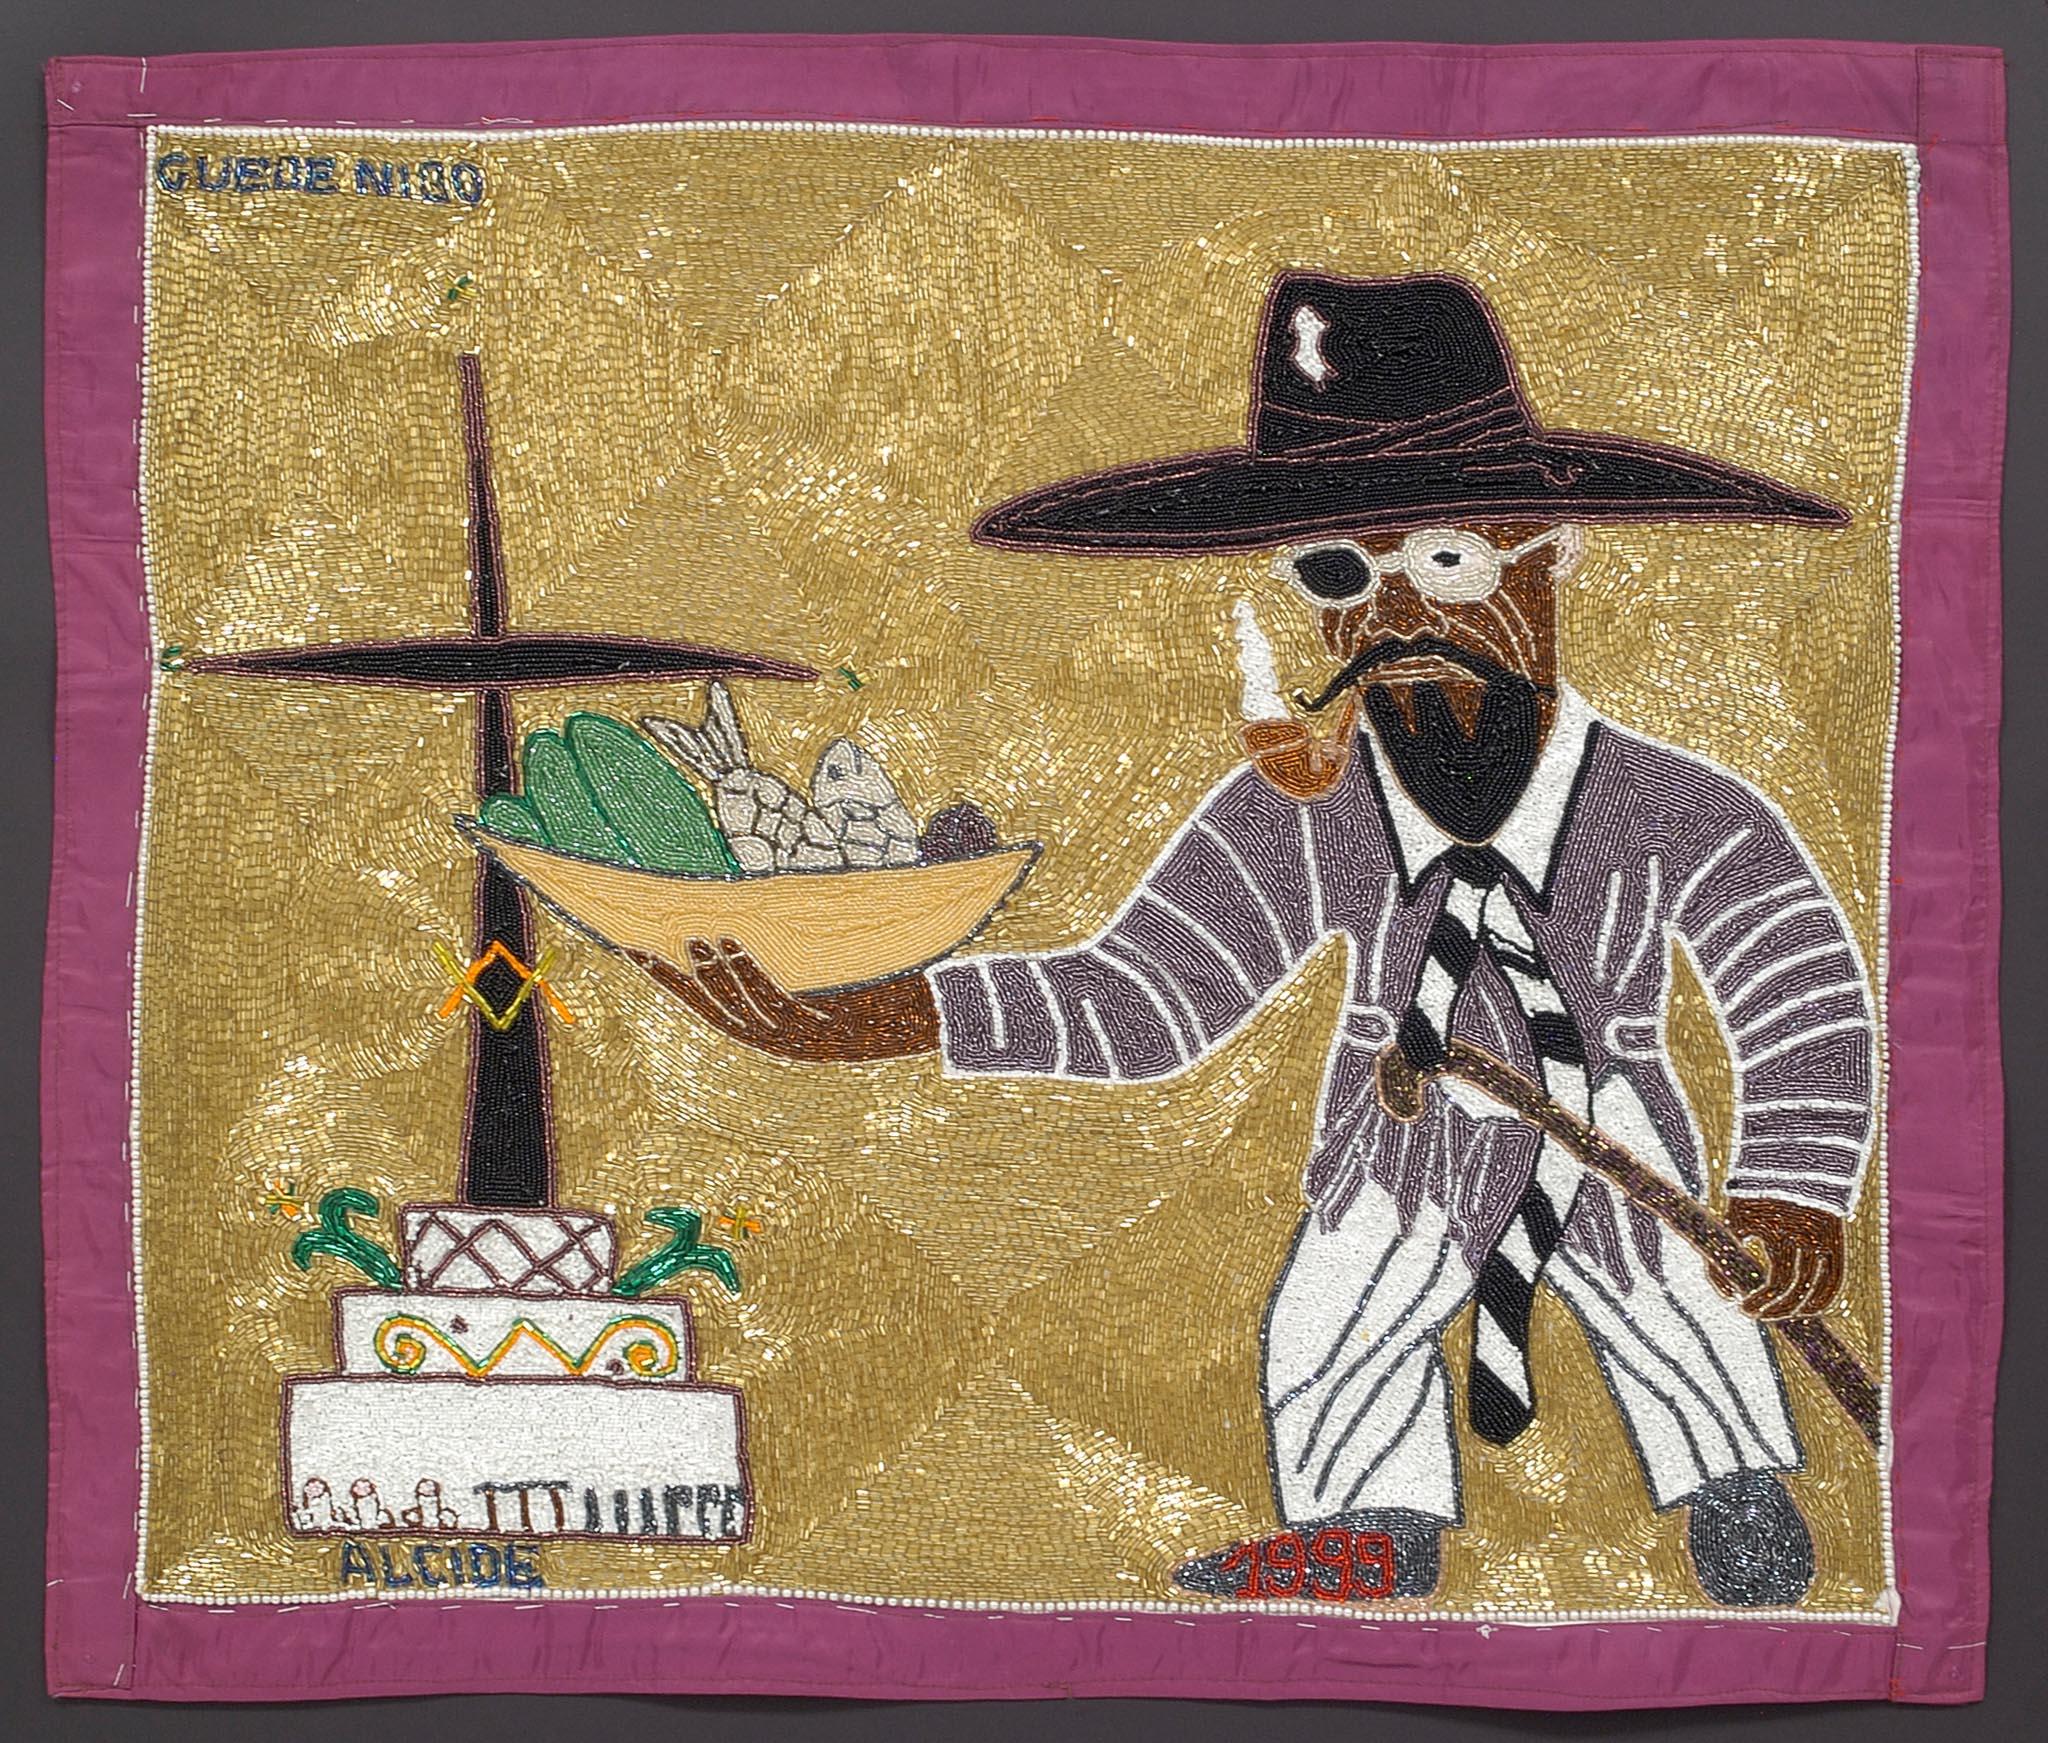 Геде Ниббо. Ритуальный флаг. Источник:https://haitianartsociety.org/marilyn-houlberg-collection